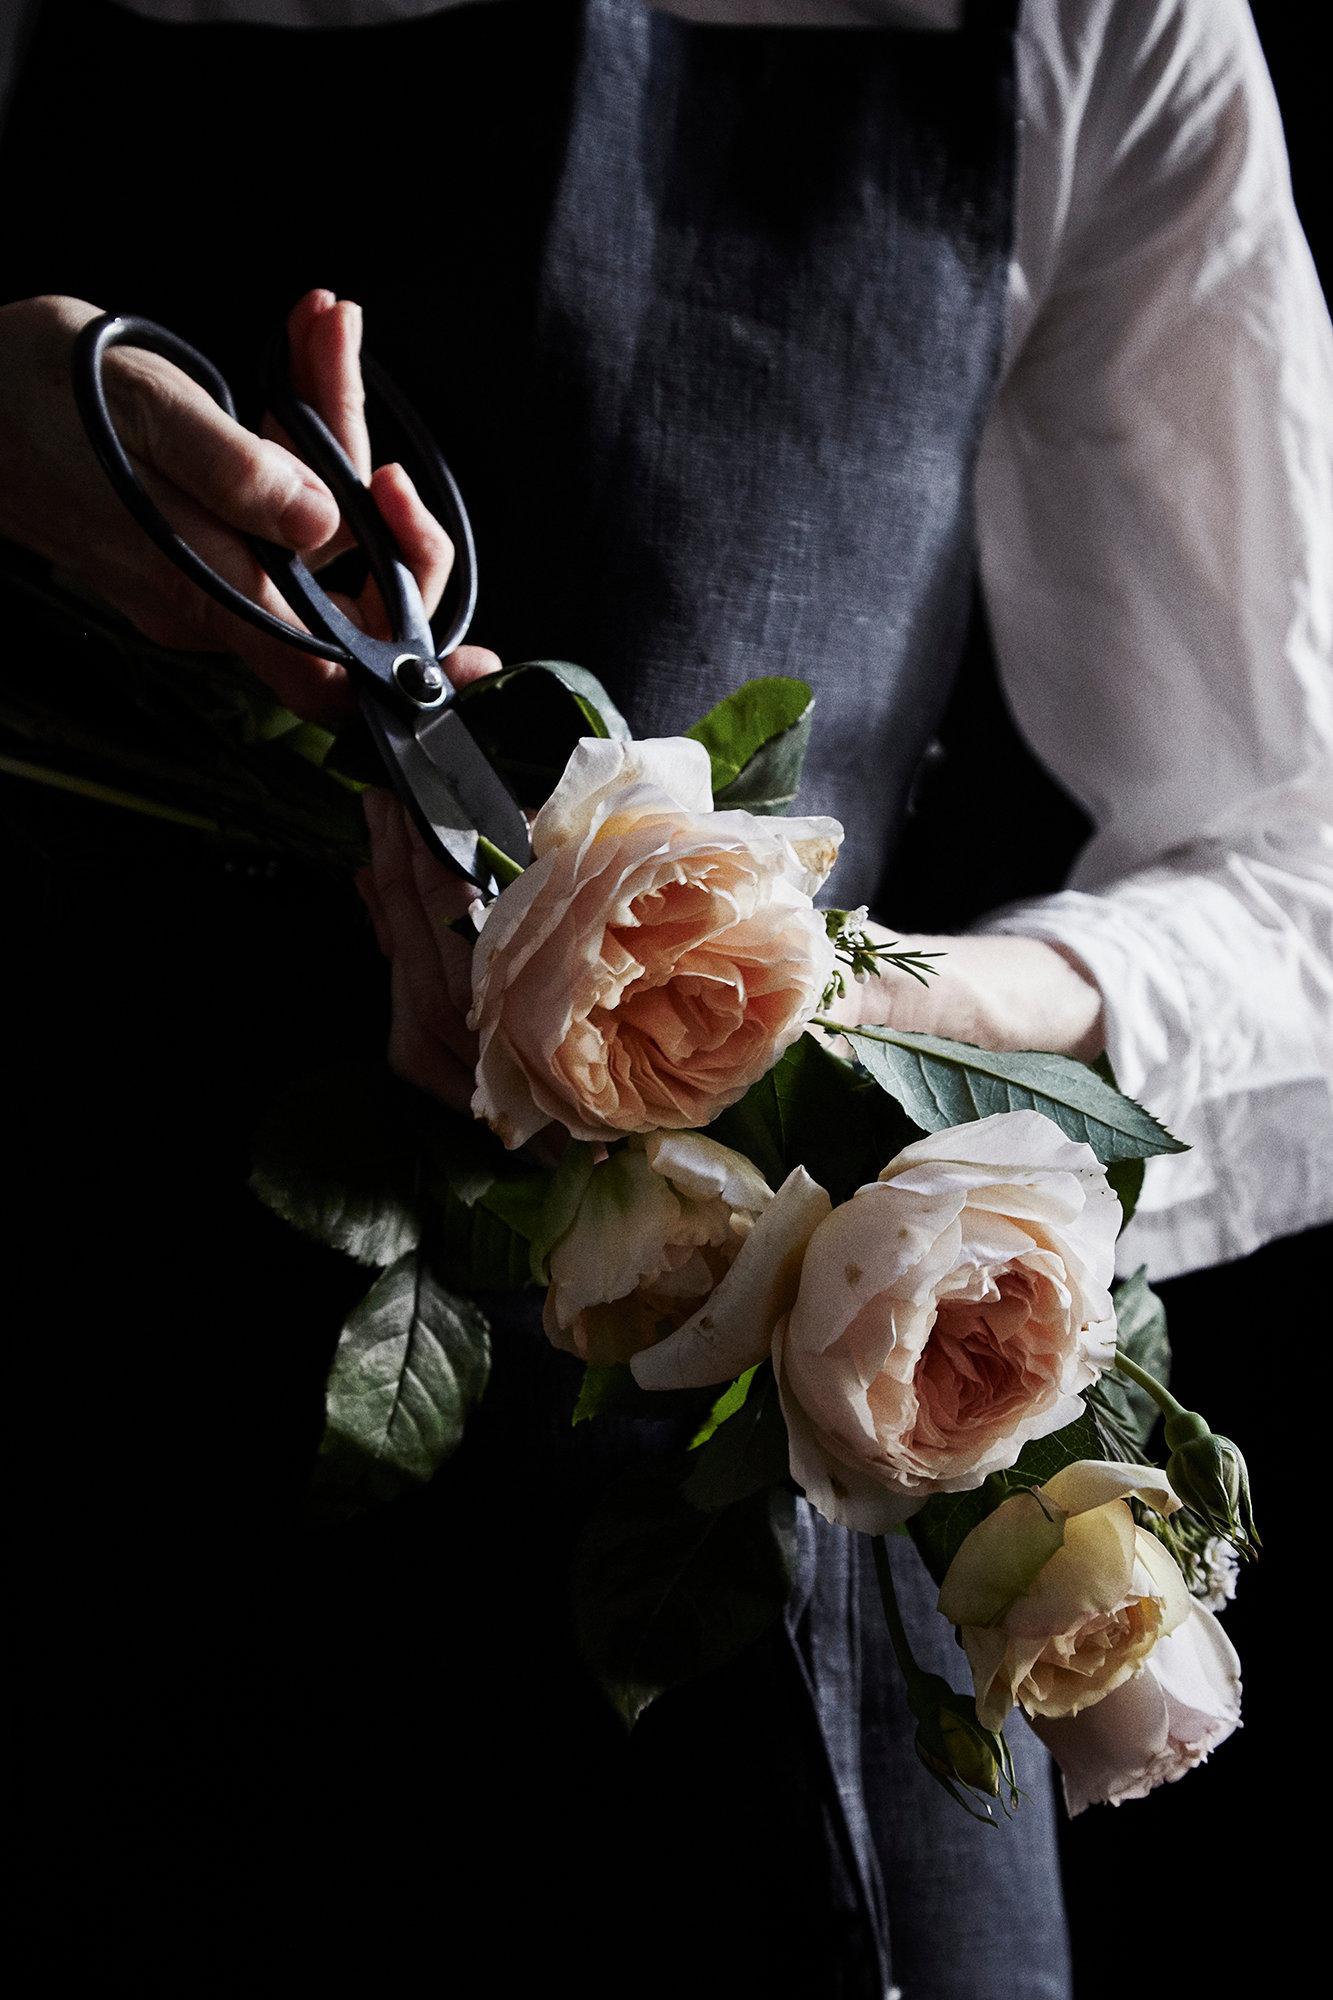 flowers_day26982.jpg